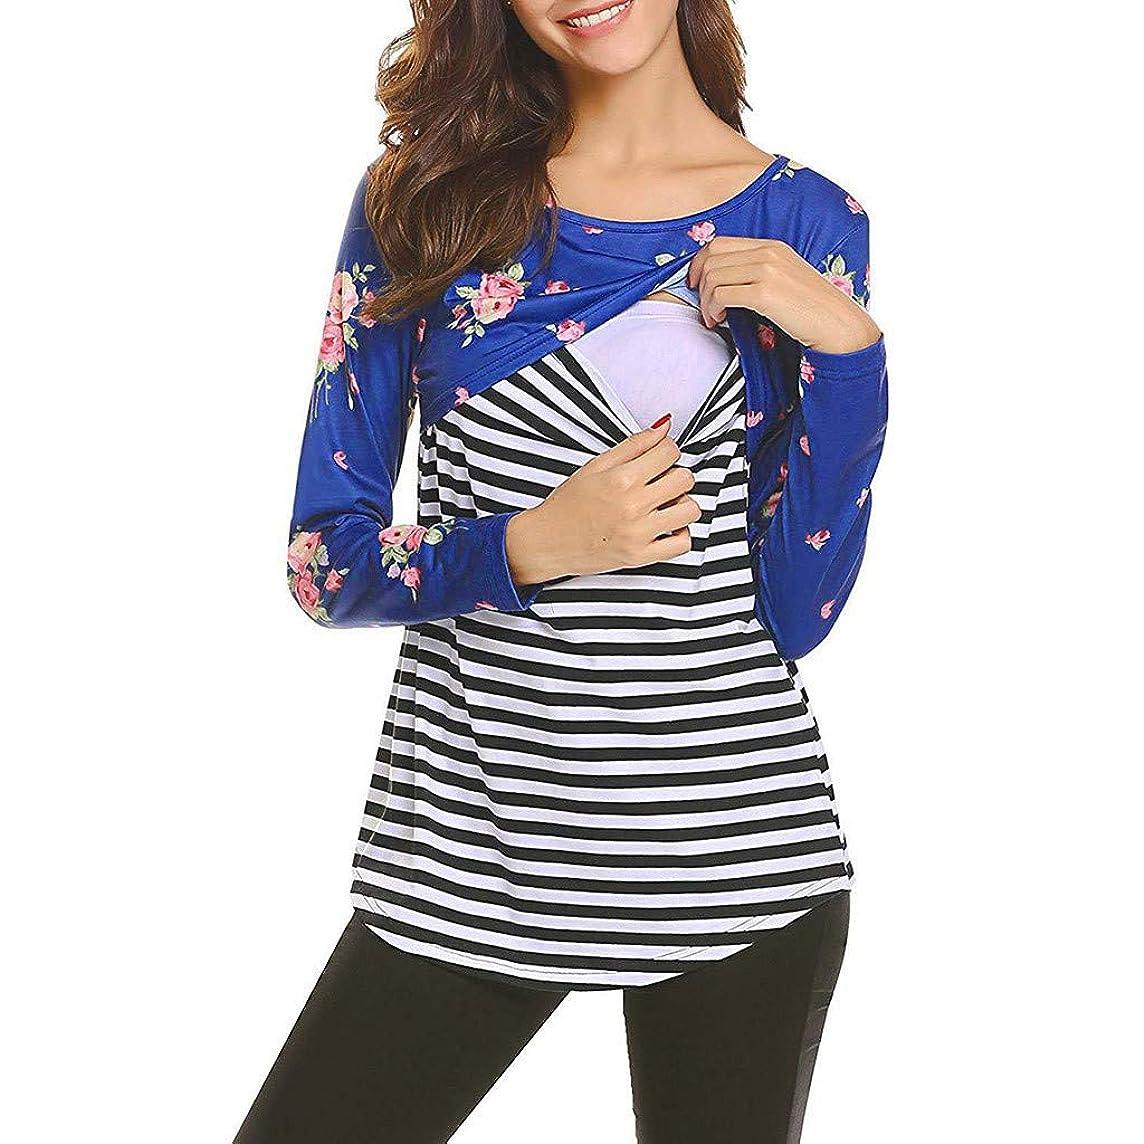 Tronet New Women's Maternity Nursing Pregnancy Splicing Stripe Floral Print T-Shirt Nursing Baby Top